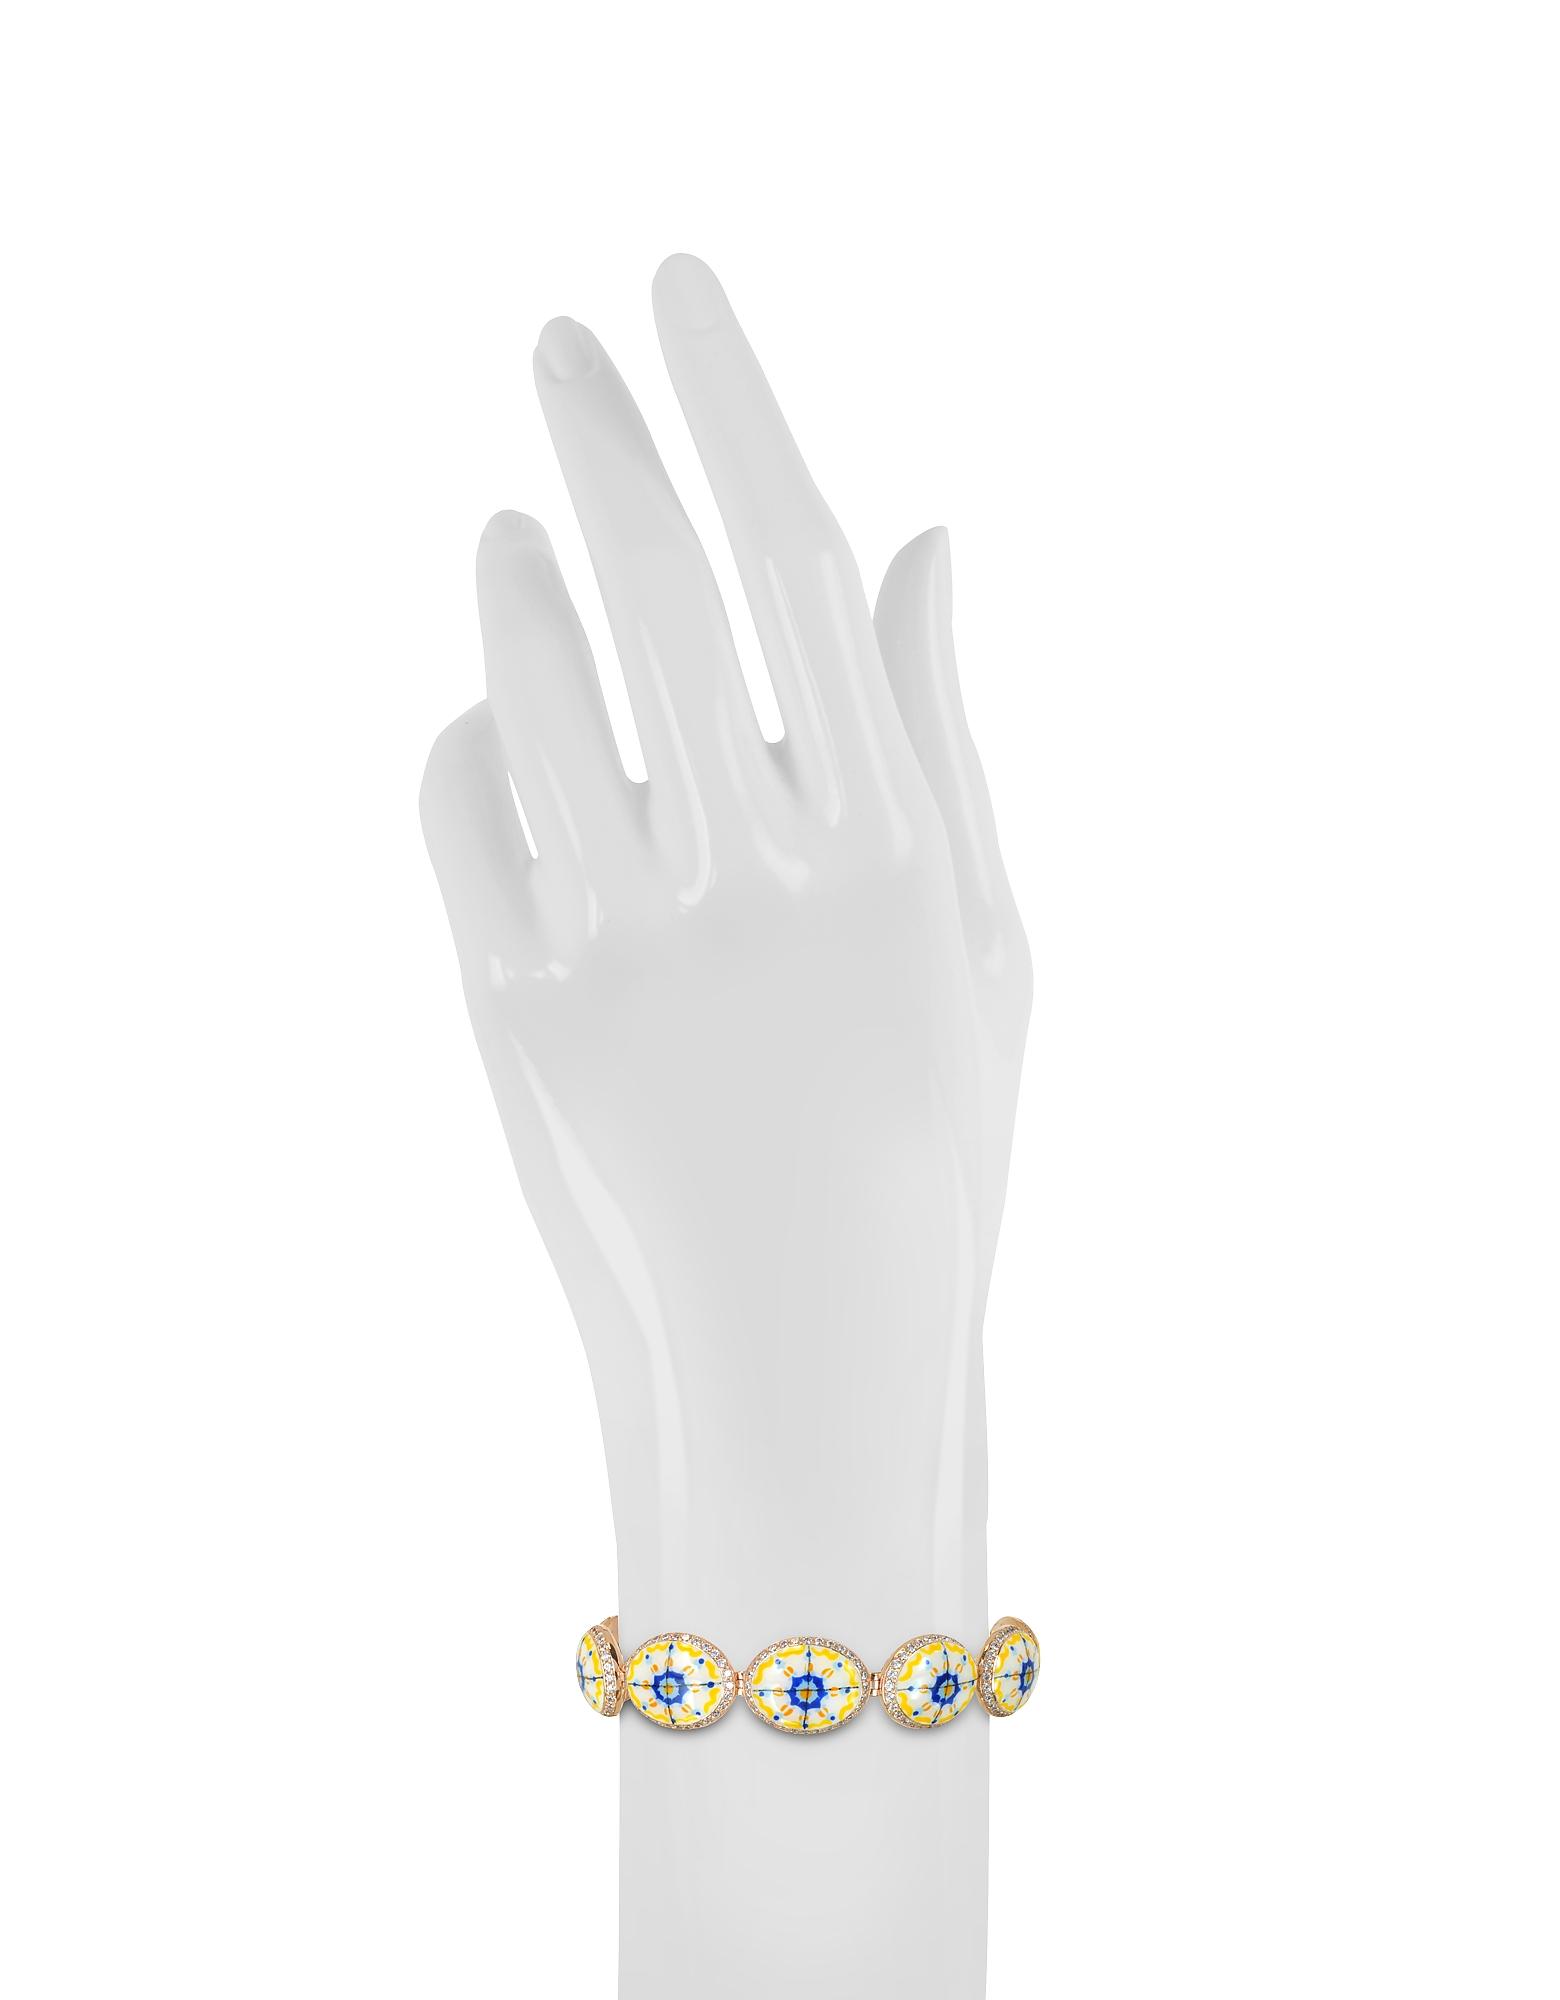 Capri Silver, Zircon and Enamel Bracelet от Forzieri.com INT